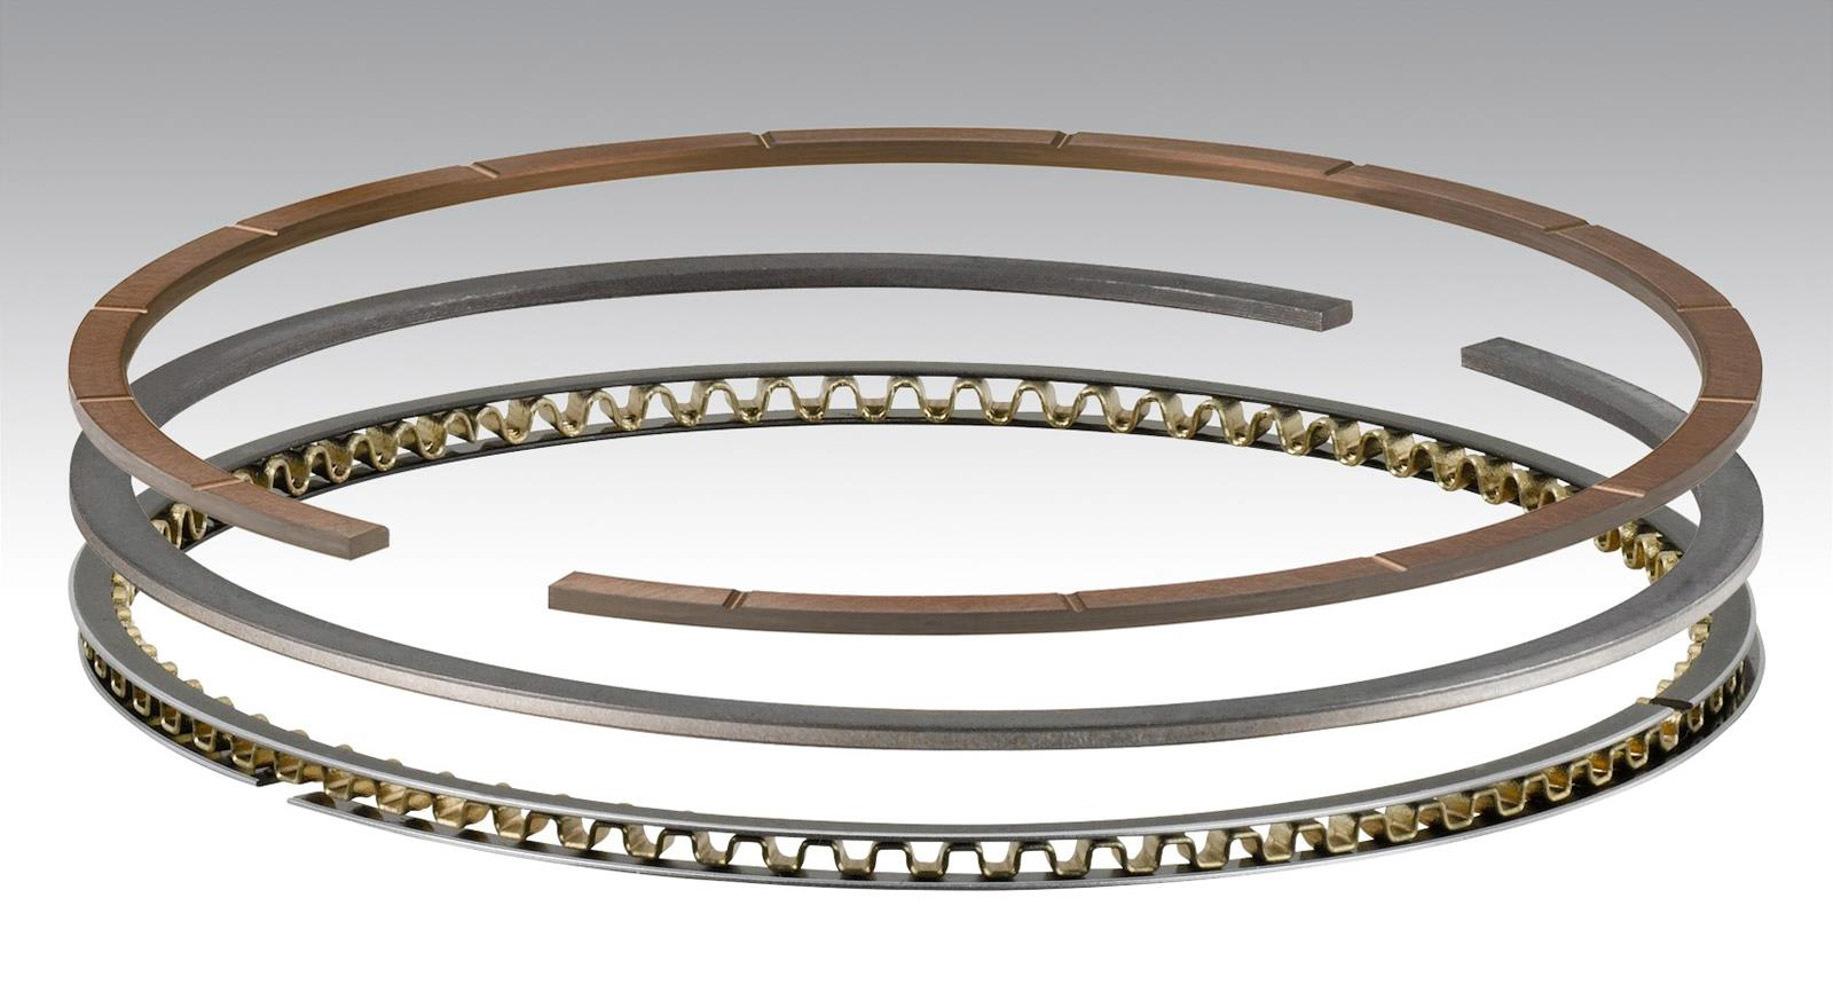 Total Seal CR3690GP-25 GP Piston Ring Set 4.025 Bore 1/16 1/16 3/16